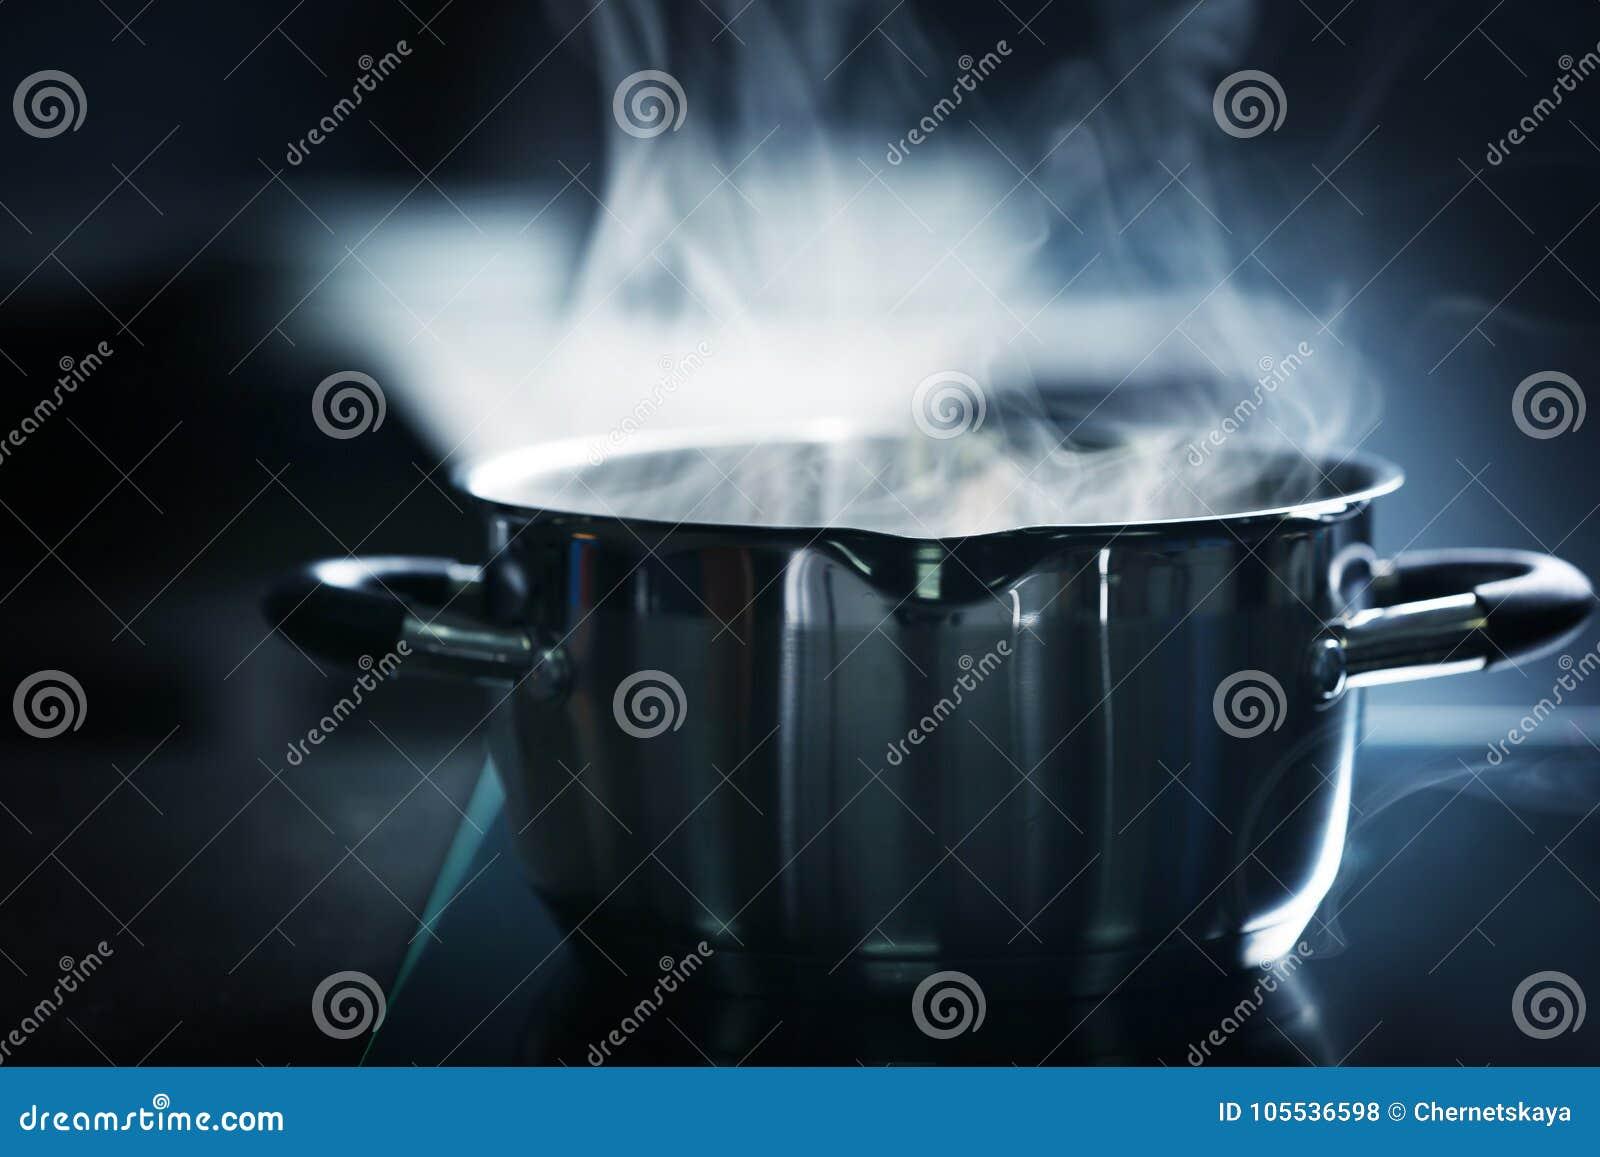 Steam over saucepan